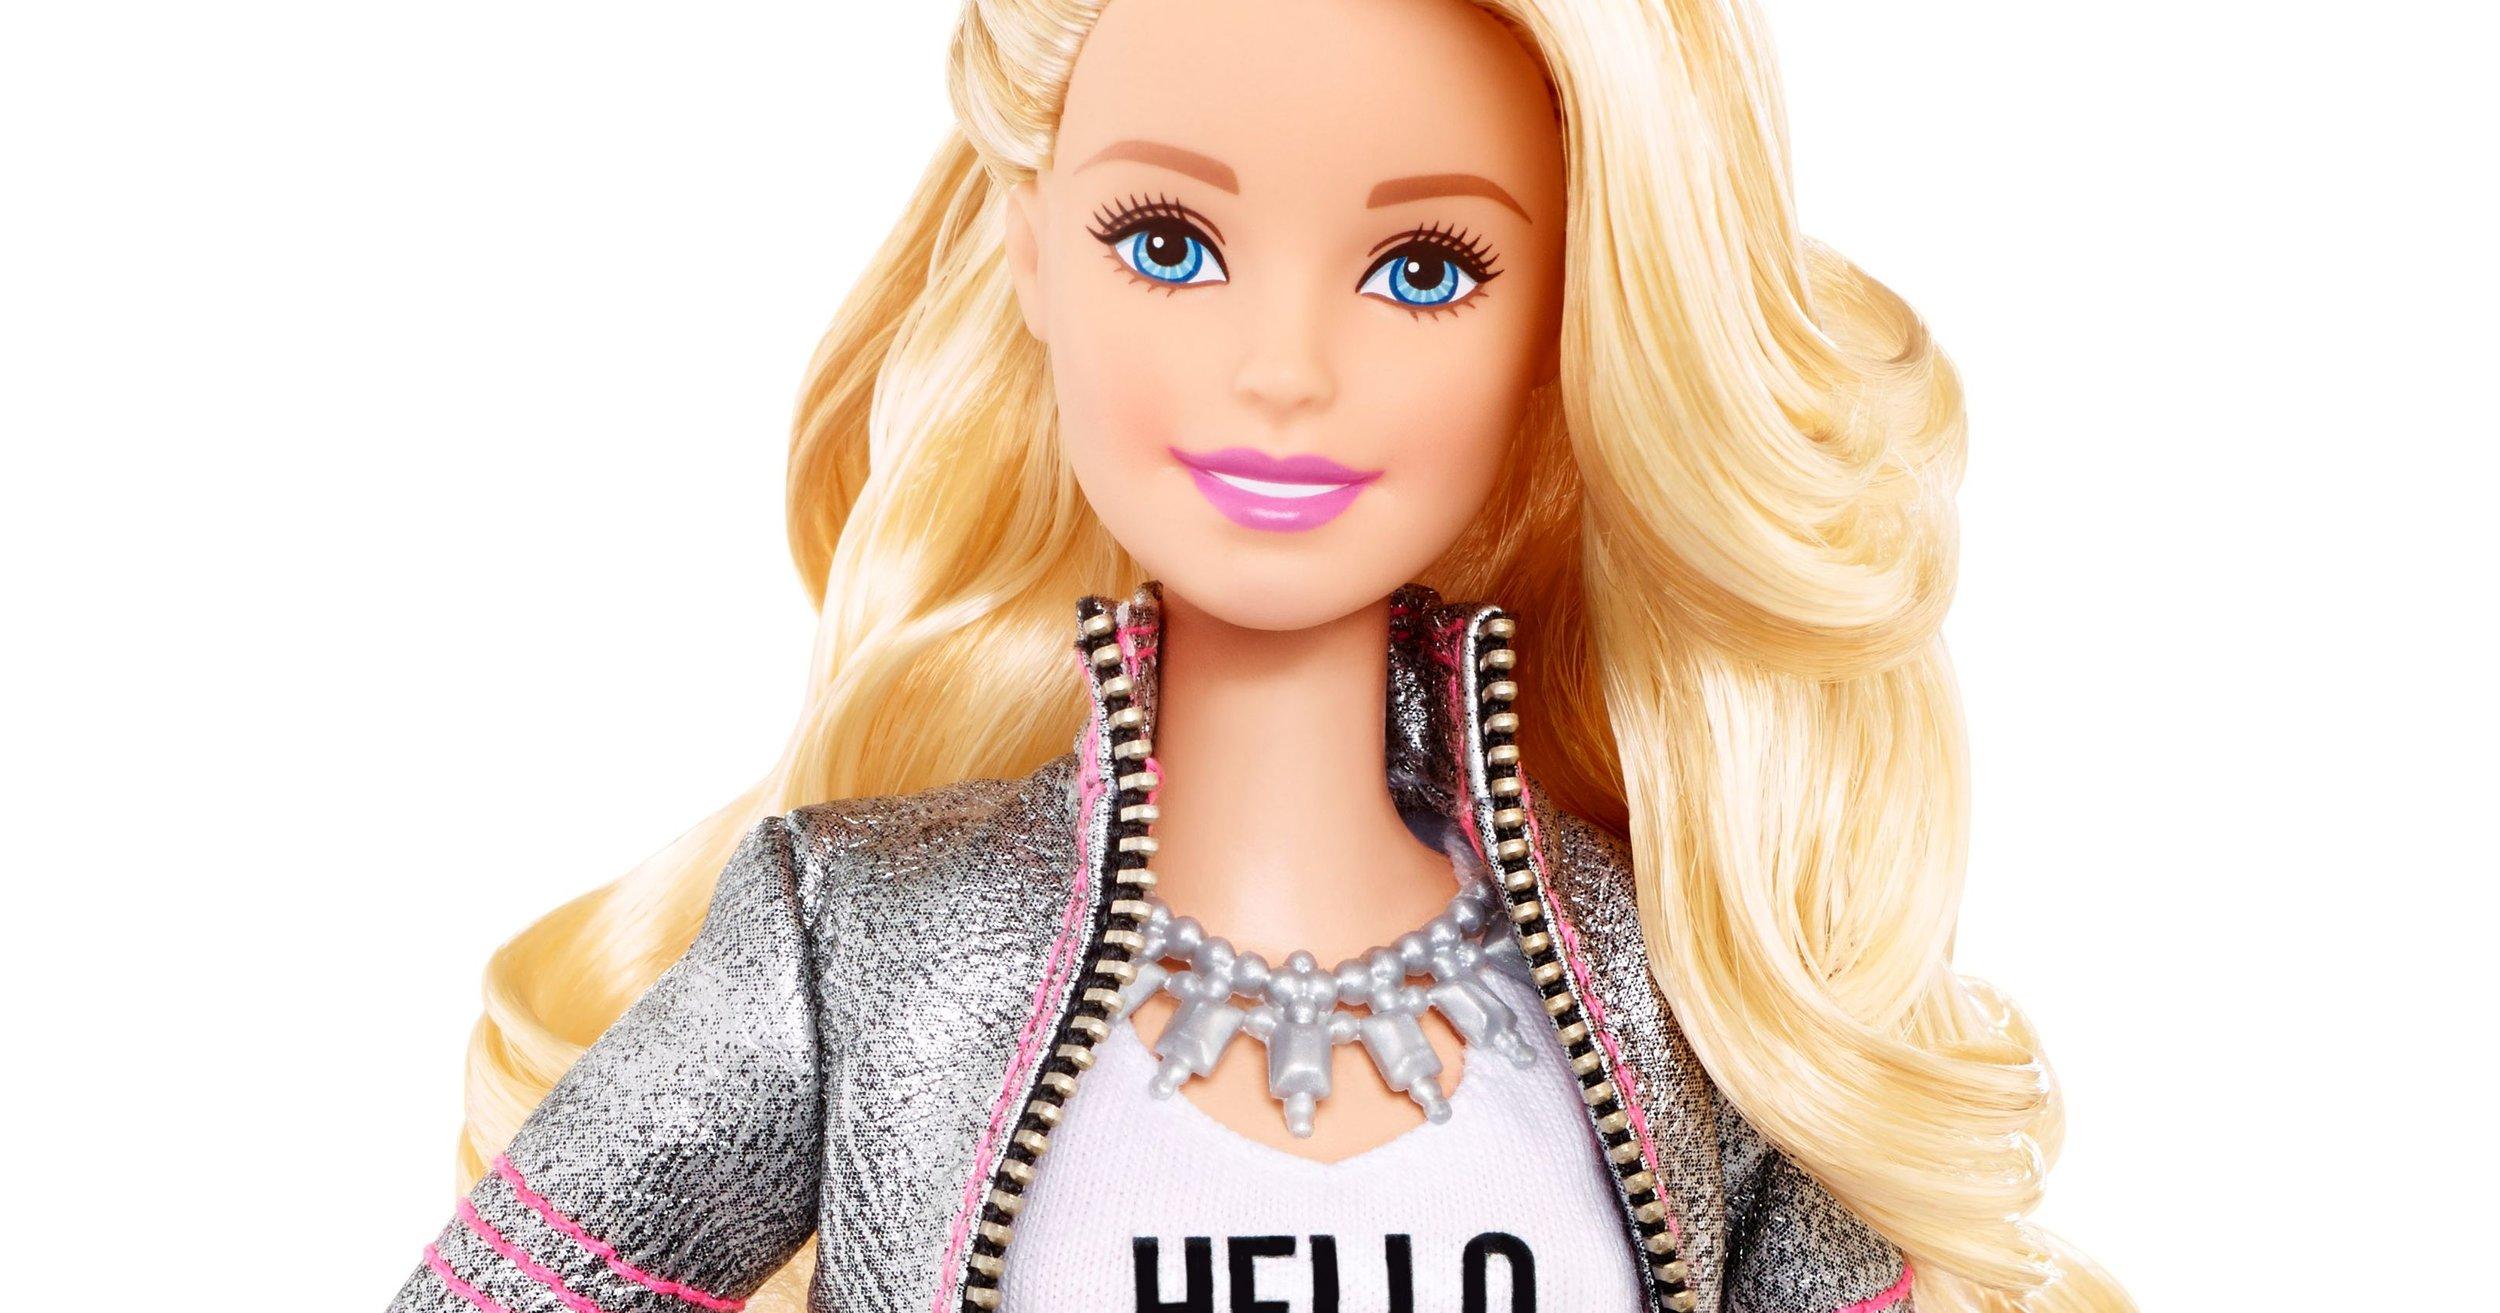 barbie doll societies destructive idealism